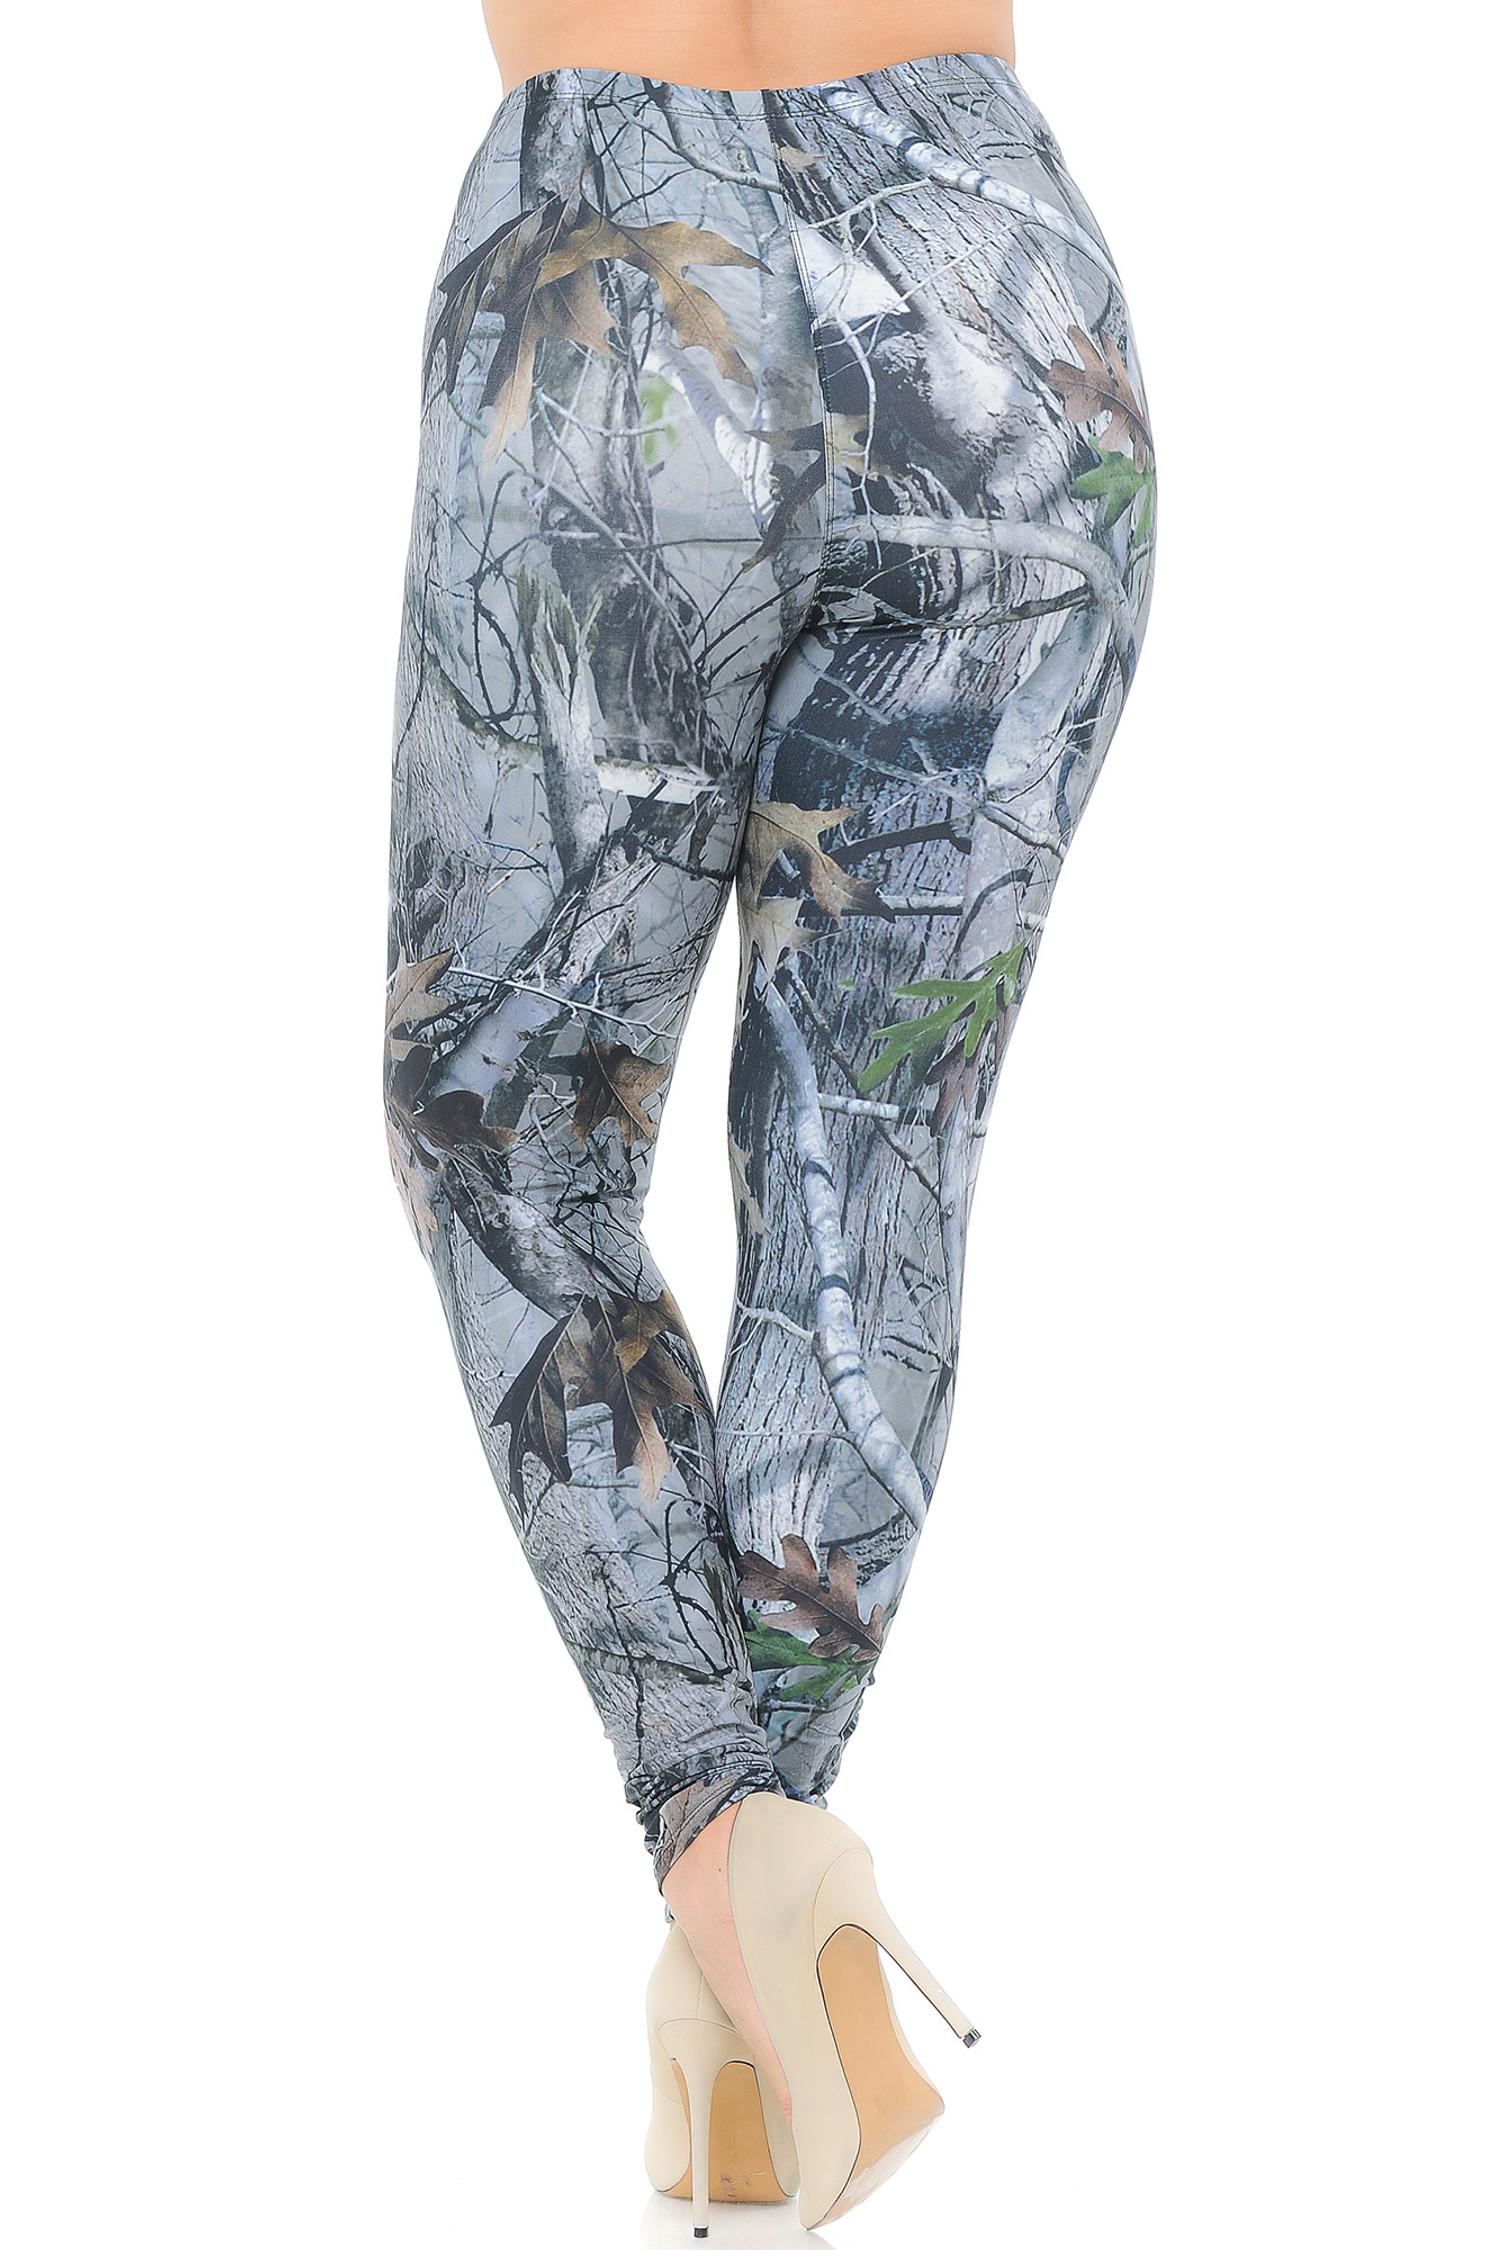 Creamy Soft Camouflage Trees Plus Size Leggings - USA Fashion™